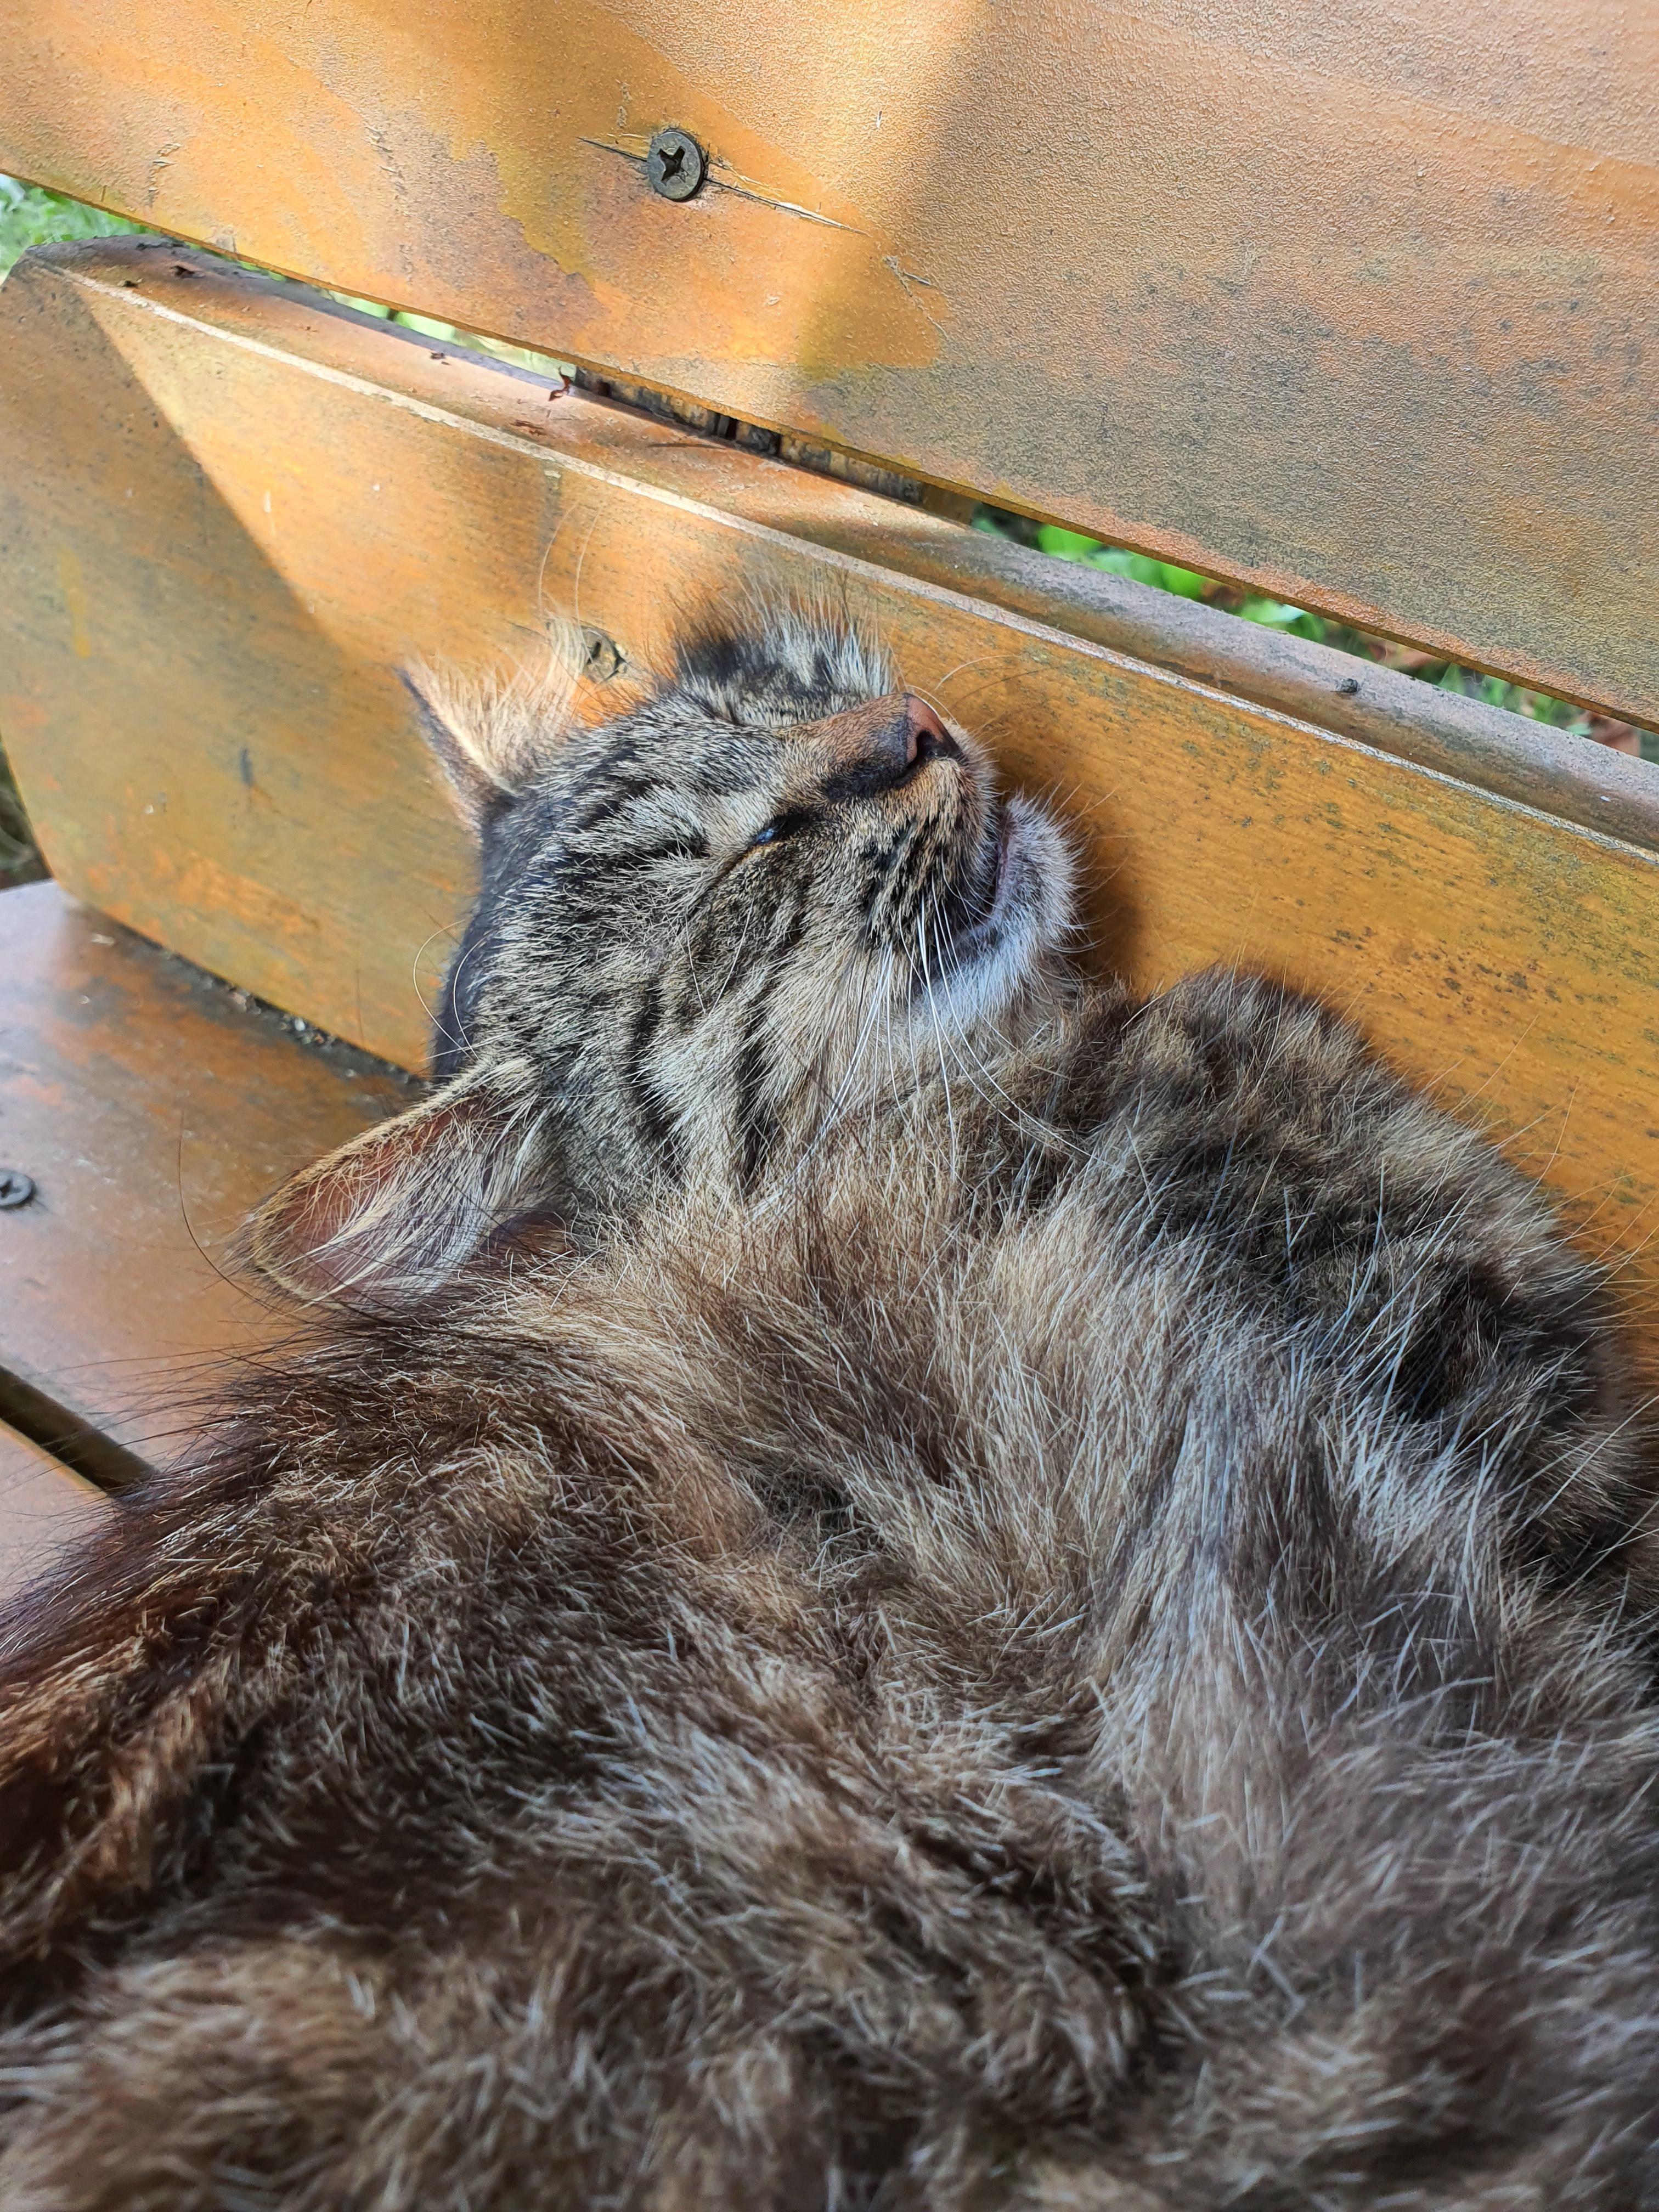 Sleepy kitty #Music #IndieArtist #Chicago #sleepykitty Sleepy kitty #Music #IndieArtist #Chicago #sleepykitty Sleepy kitty #Music #IndieArtist #Chicago #sleepykitty Sleepy kitty #Music #IndieArtist #Chicago #sleepykitty Sleepy kitty #Music #IndieArtist #Chicago #sleepykitty Sleepy kitty #Music #IndieArtist #Chicago #sleepykitty Sleepy kitty #Music #IndieArtist #Chicago #sleepykitty Sleepy kitty #Music #IndieArtist #Chicago #sleepykitty Sleepy kitty #Music #IndieArtist #Chicago #sleepykitty Sleep #sleepykitty